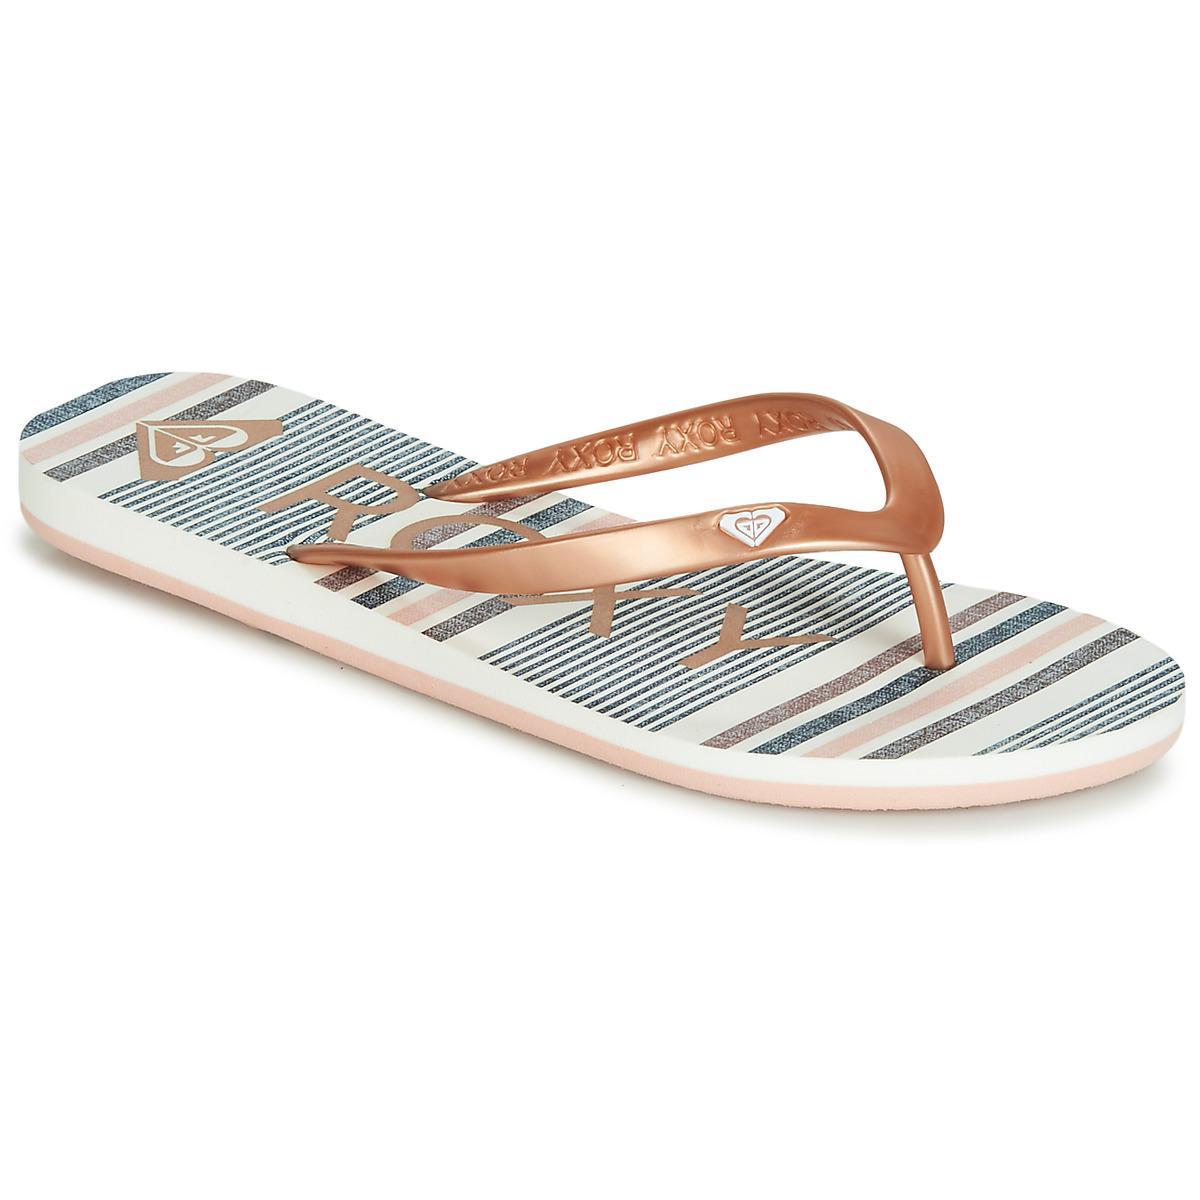 40ab8bbba Roxy Tahiti Vi J Sndl Mul Women s Flip Flops   Sandals (shoes) In ...